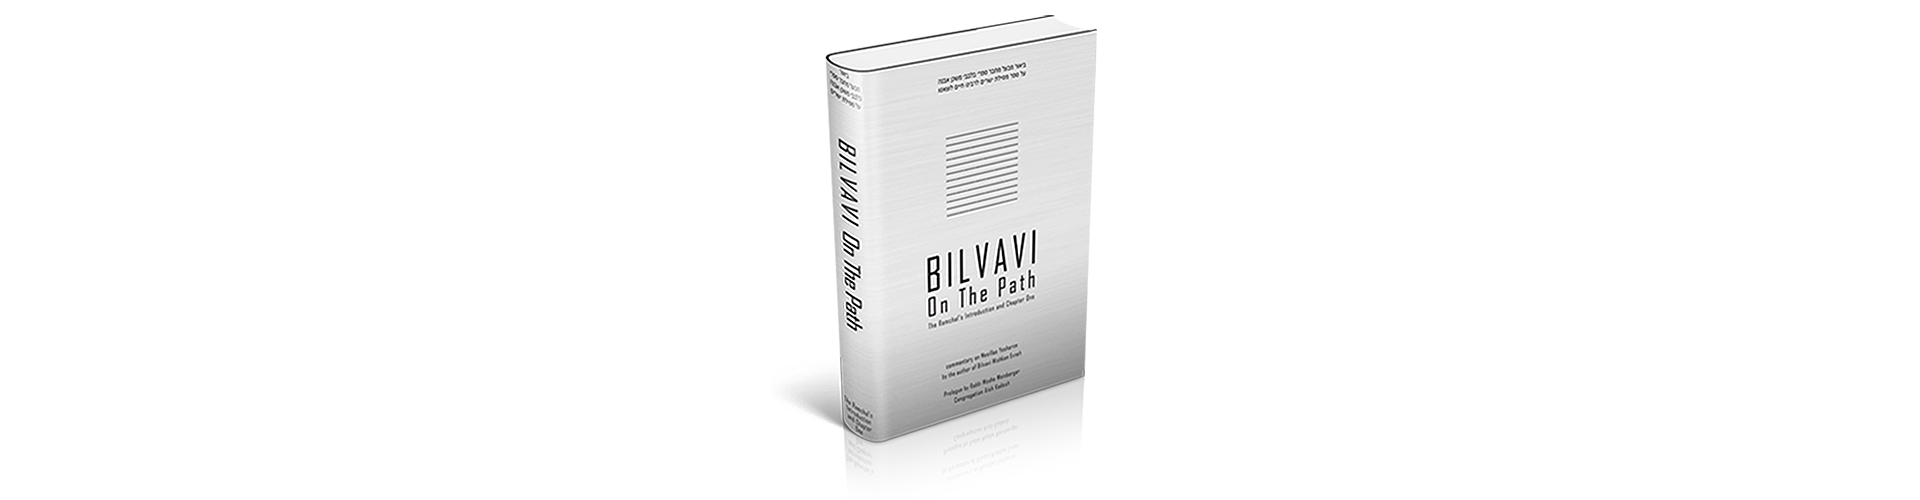 Bilvavi on the Path